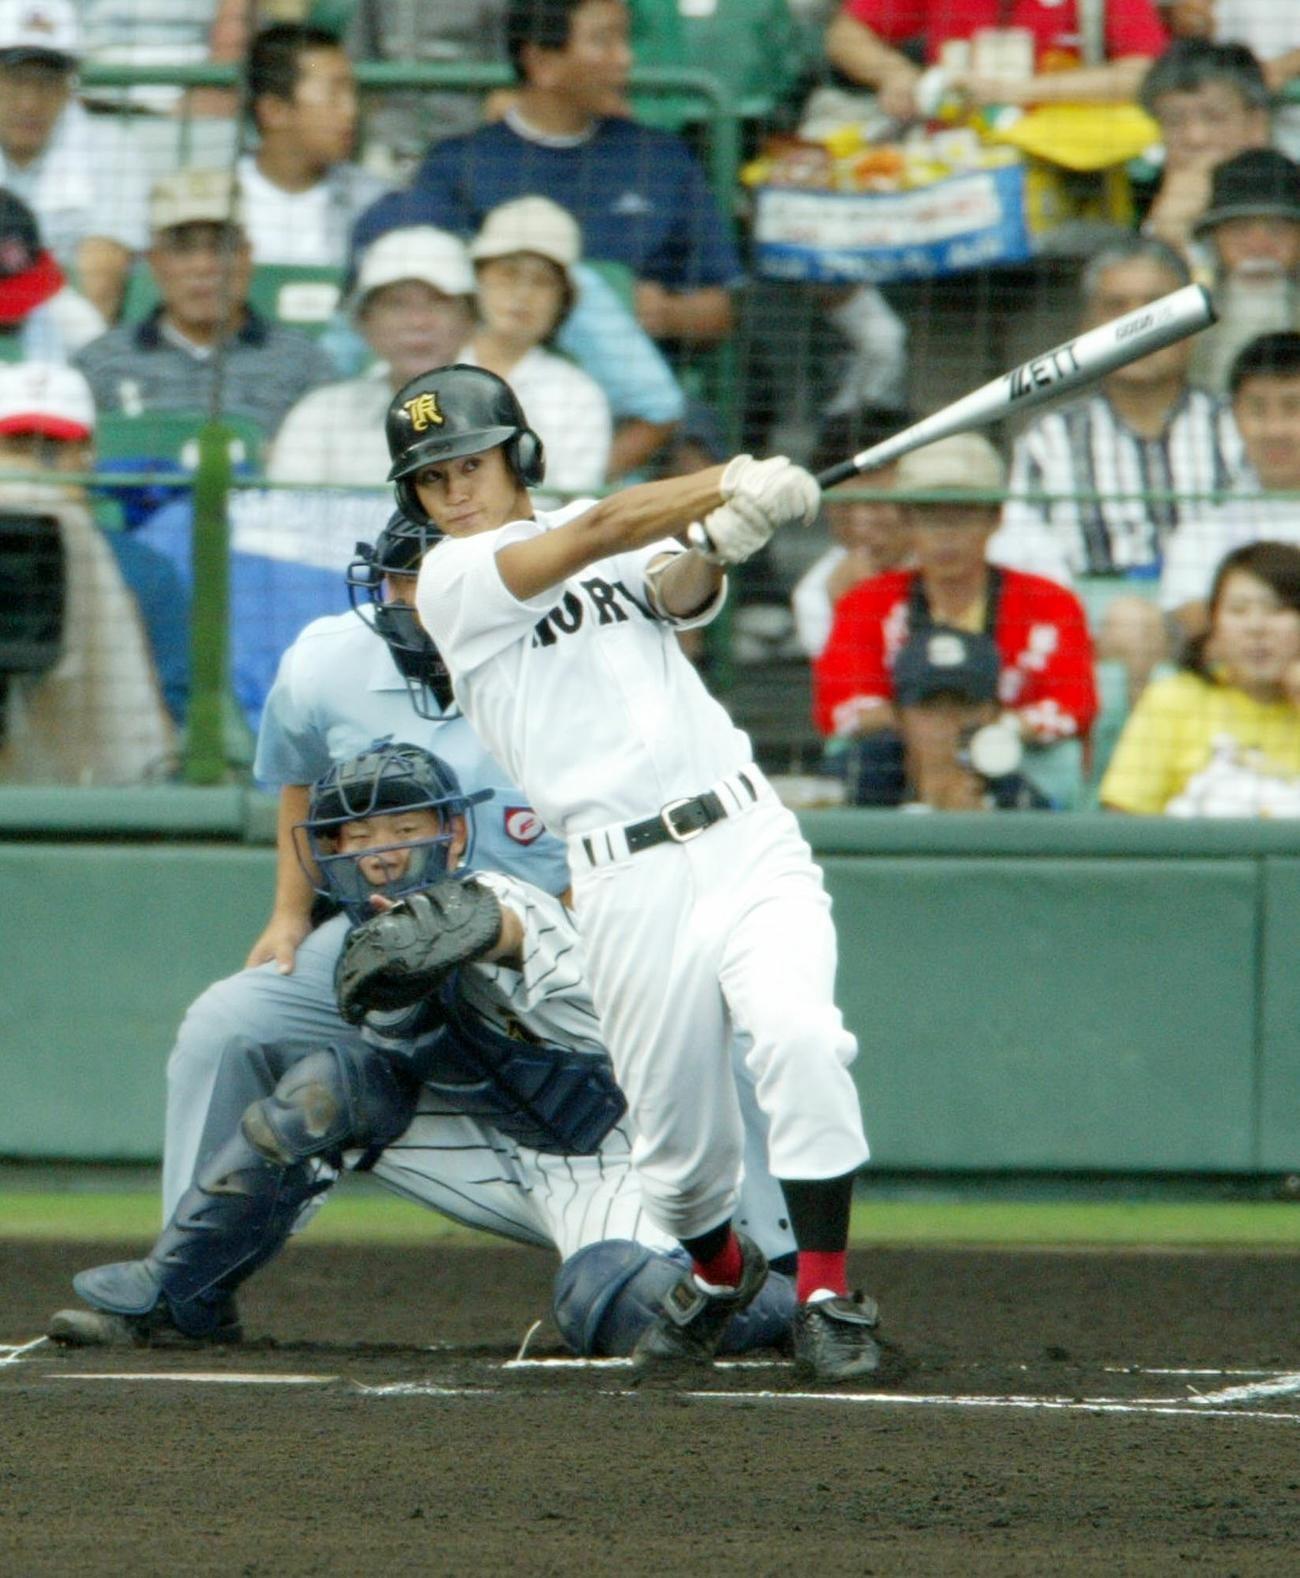 03年8月9日、東海大甲府戦の1回表、左越え先頭打者本塁打を放つ広陵・上本博紀